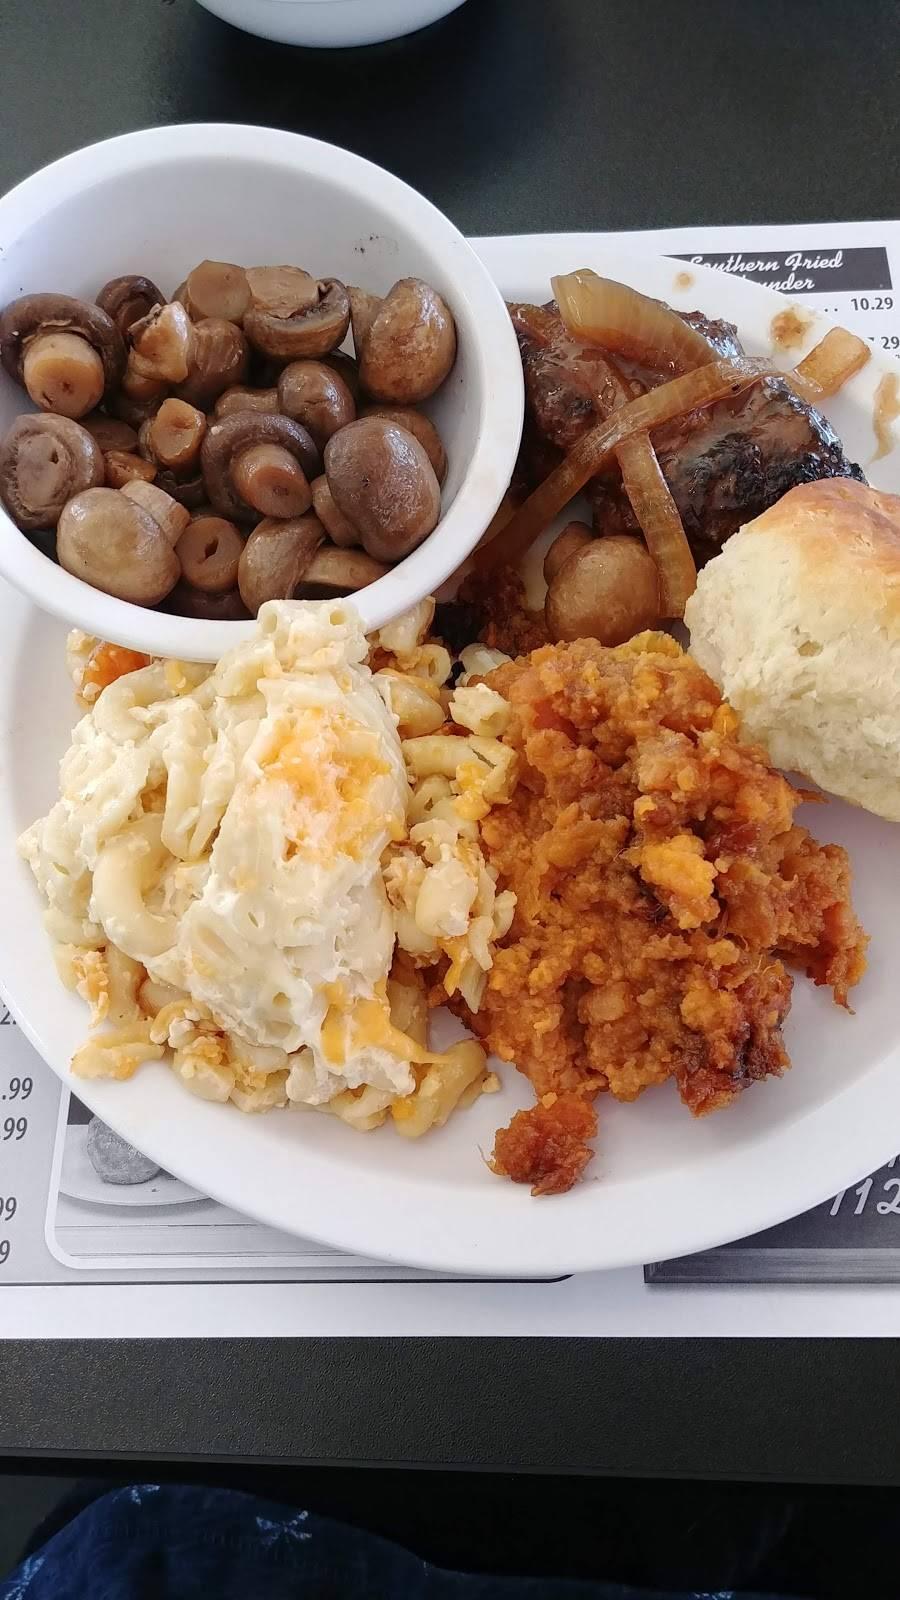 Southern Chicken   restaurant   1012 US-17 BUS, Surfside Beach, SC 29575, USA   8437128611 OR +1 843-712-8611